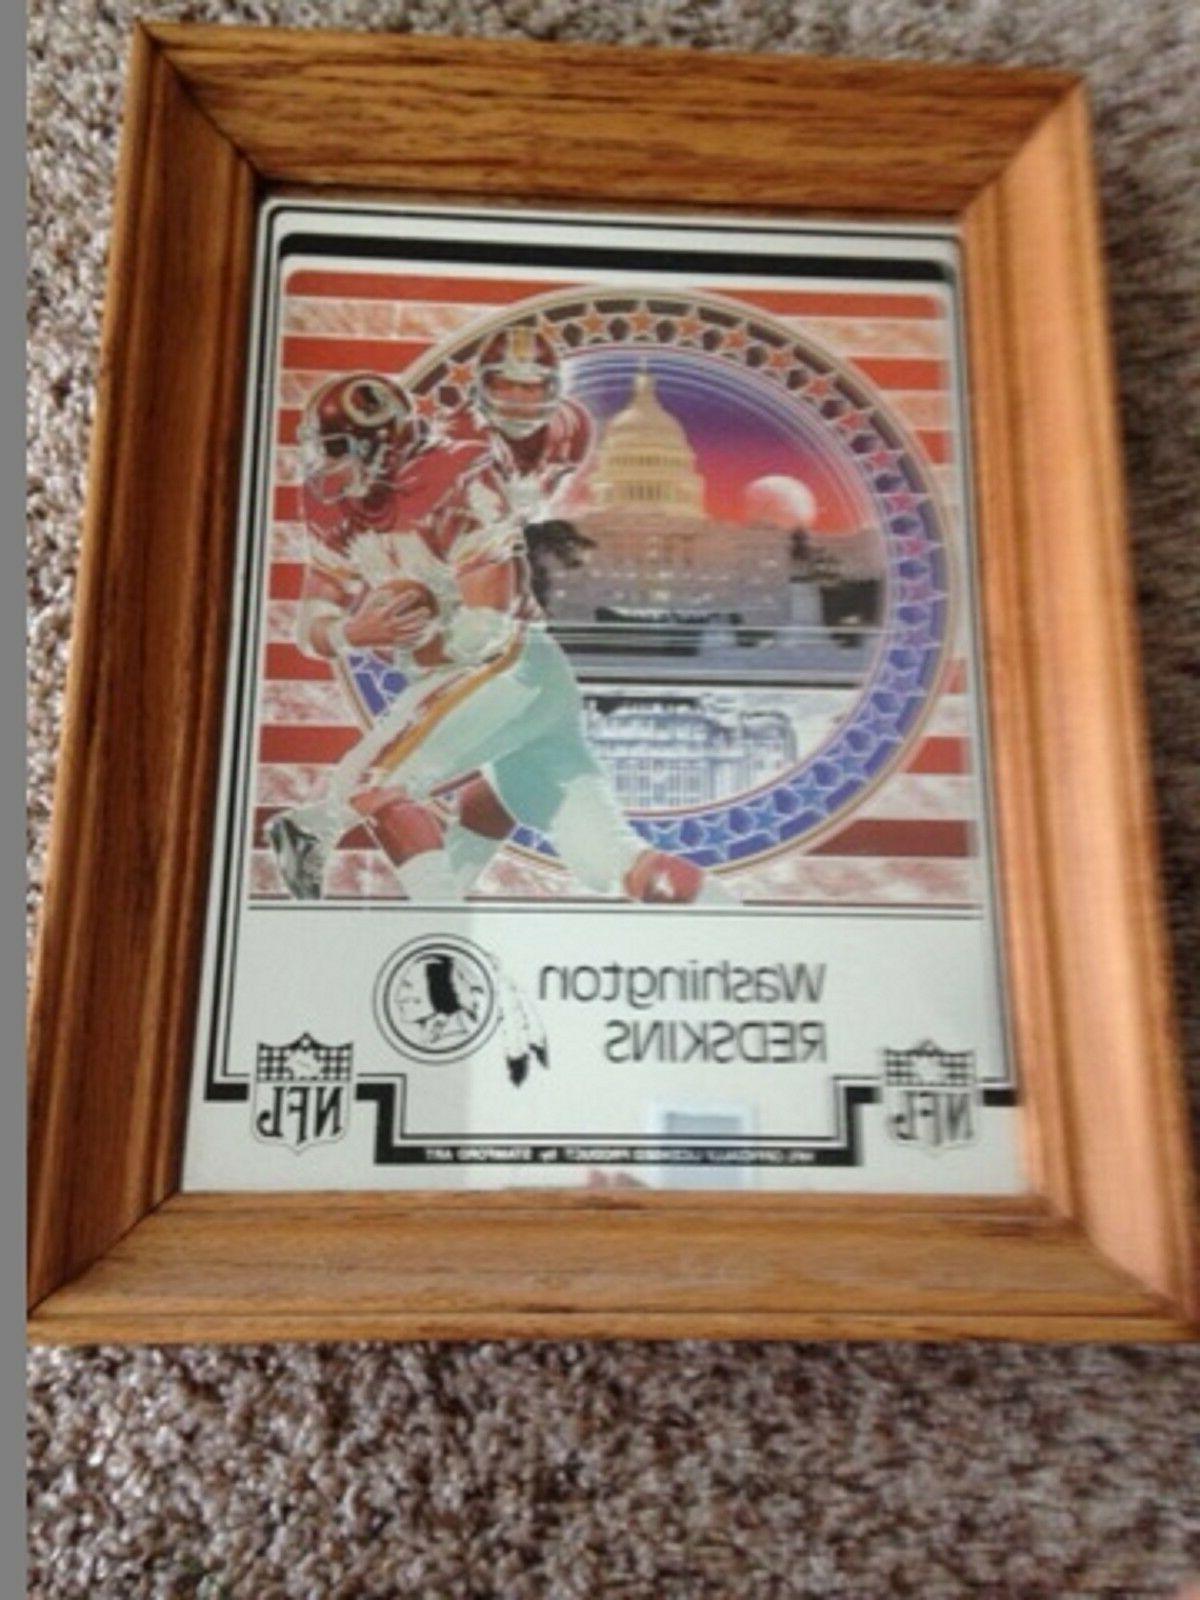 1982 washington redskins framed picture mirrored sanford